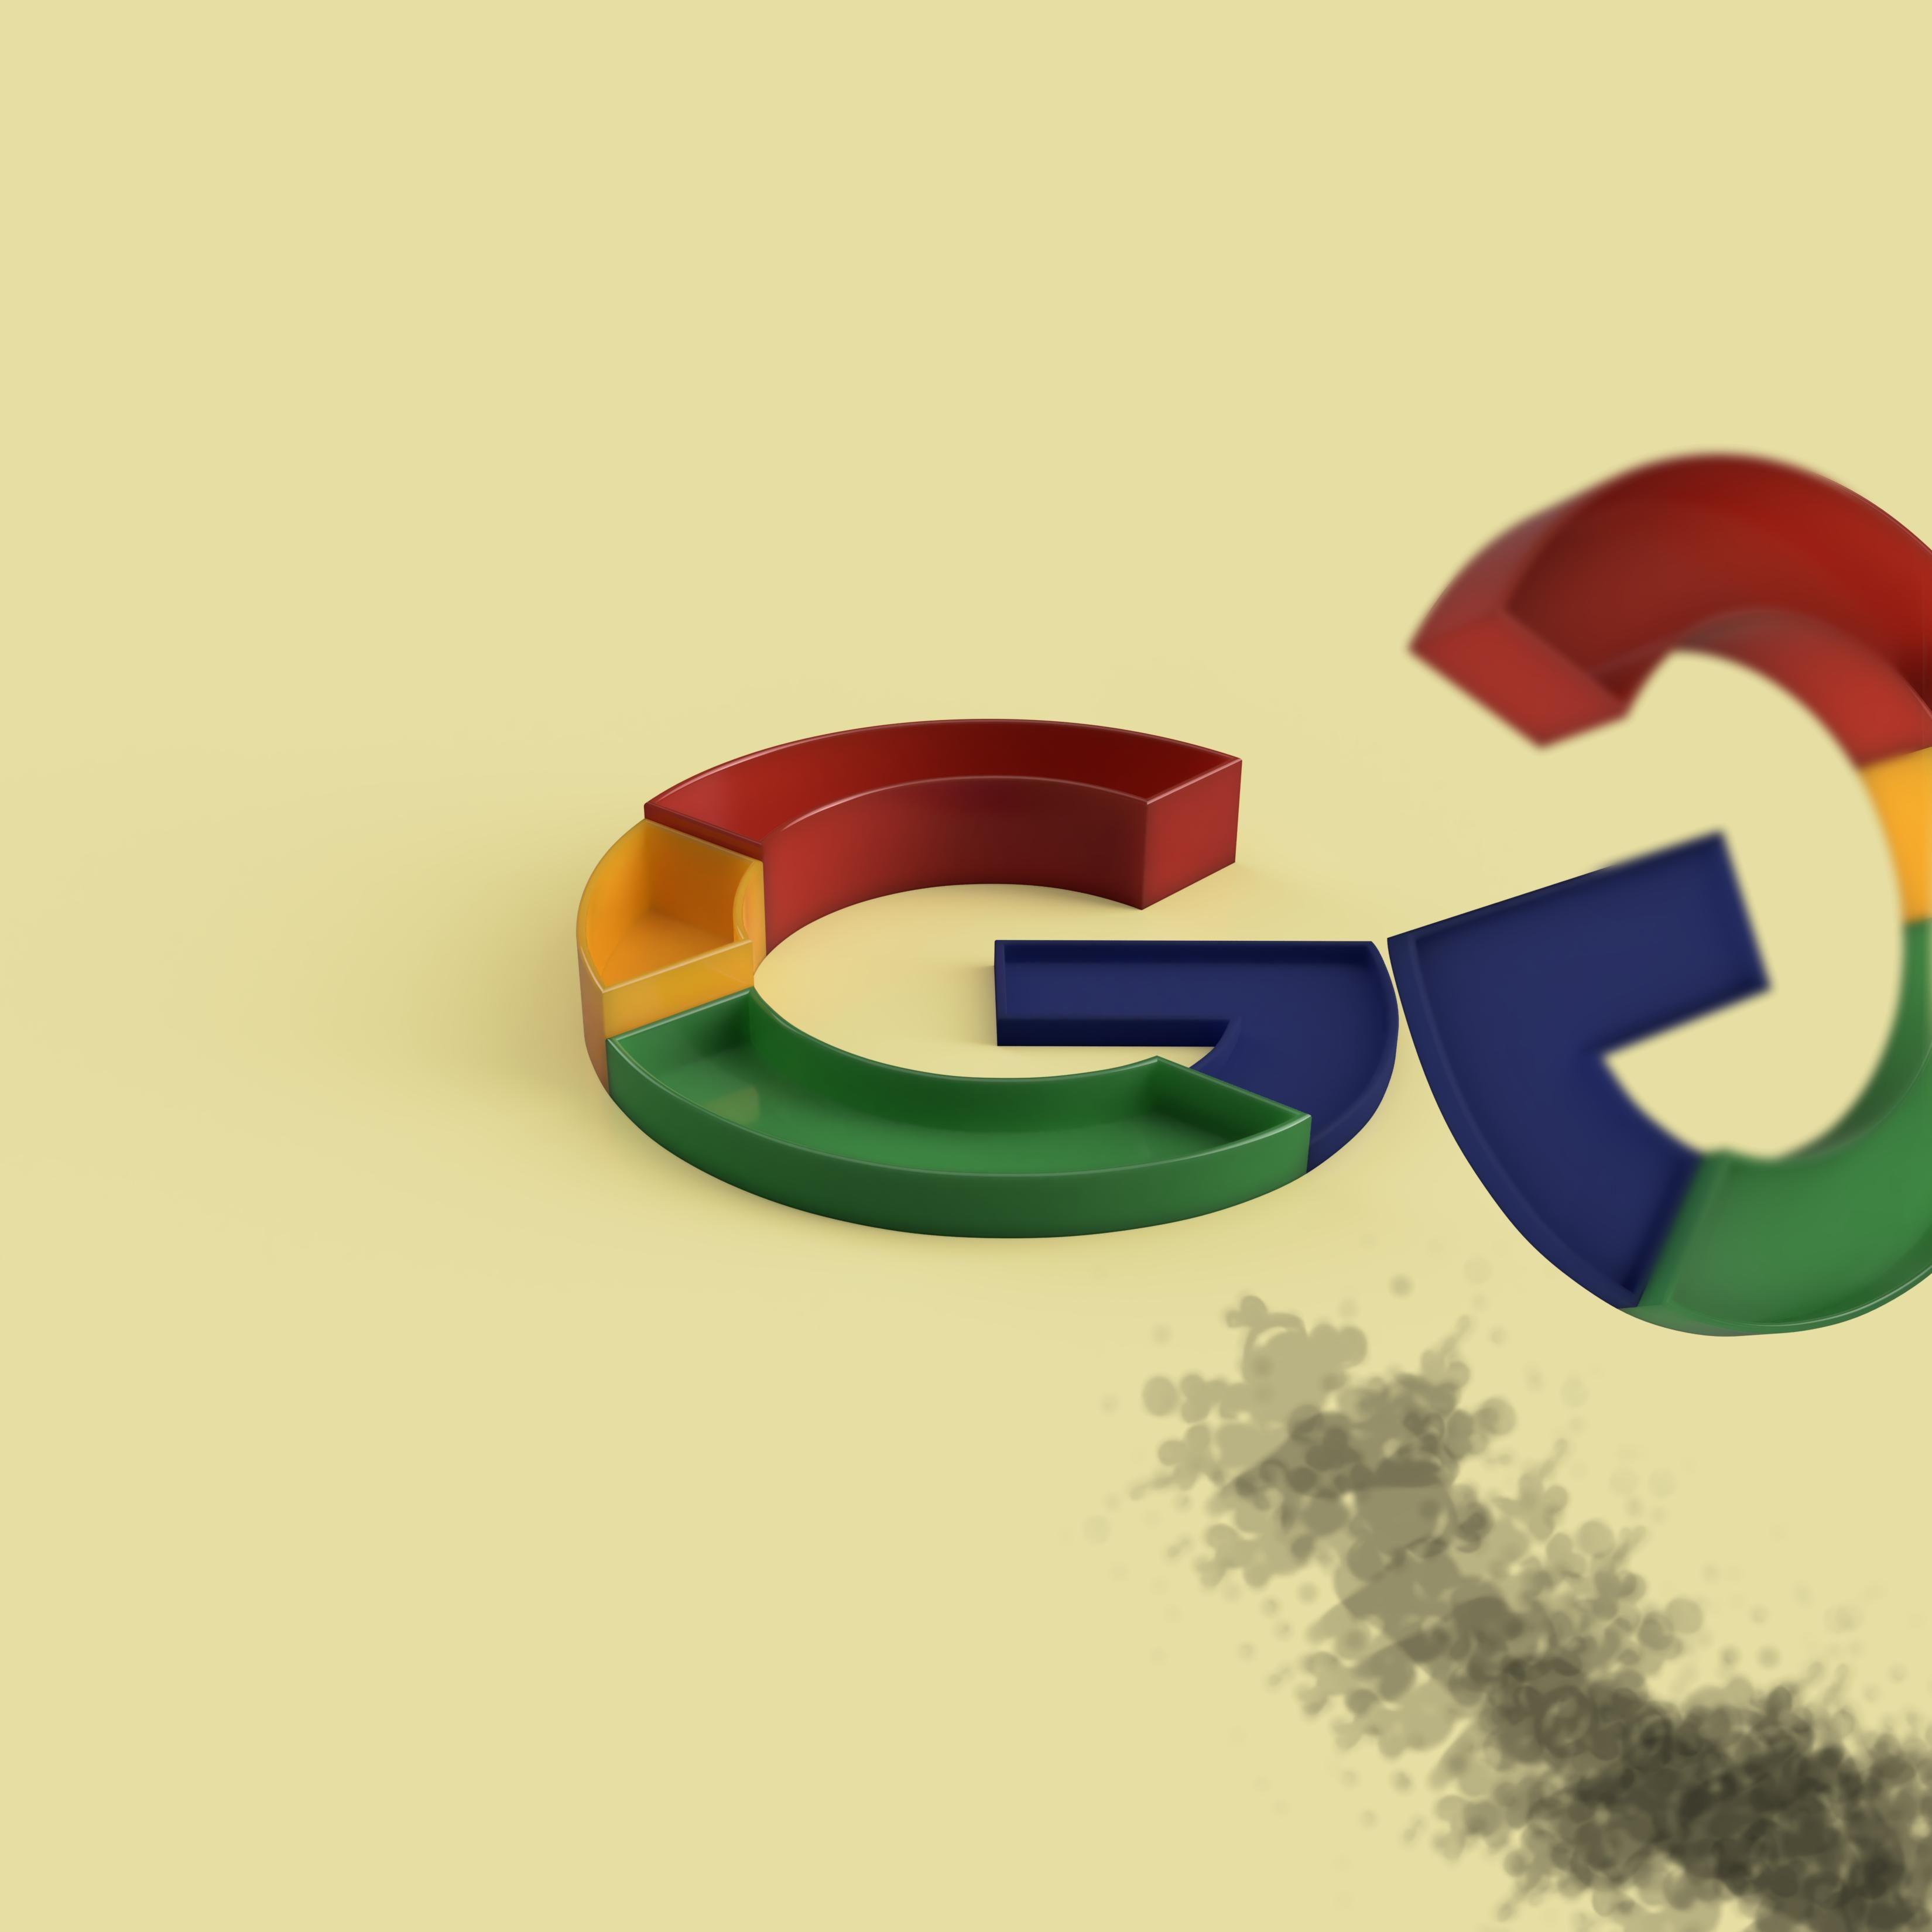 Google-3d-lcs20192fab2-3500-3500